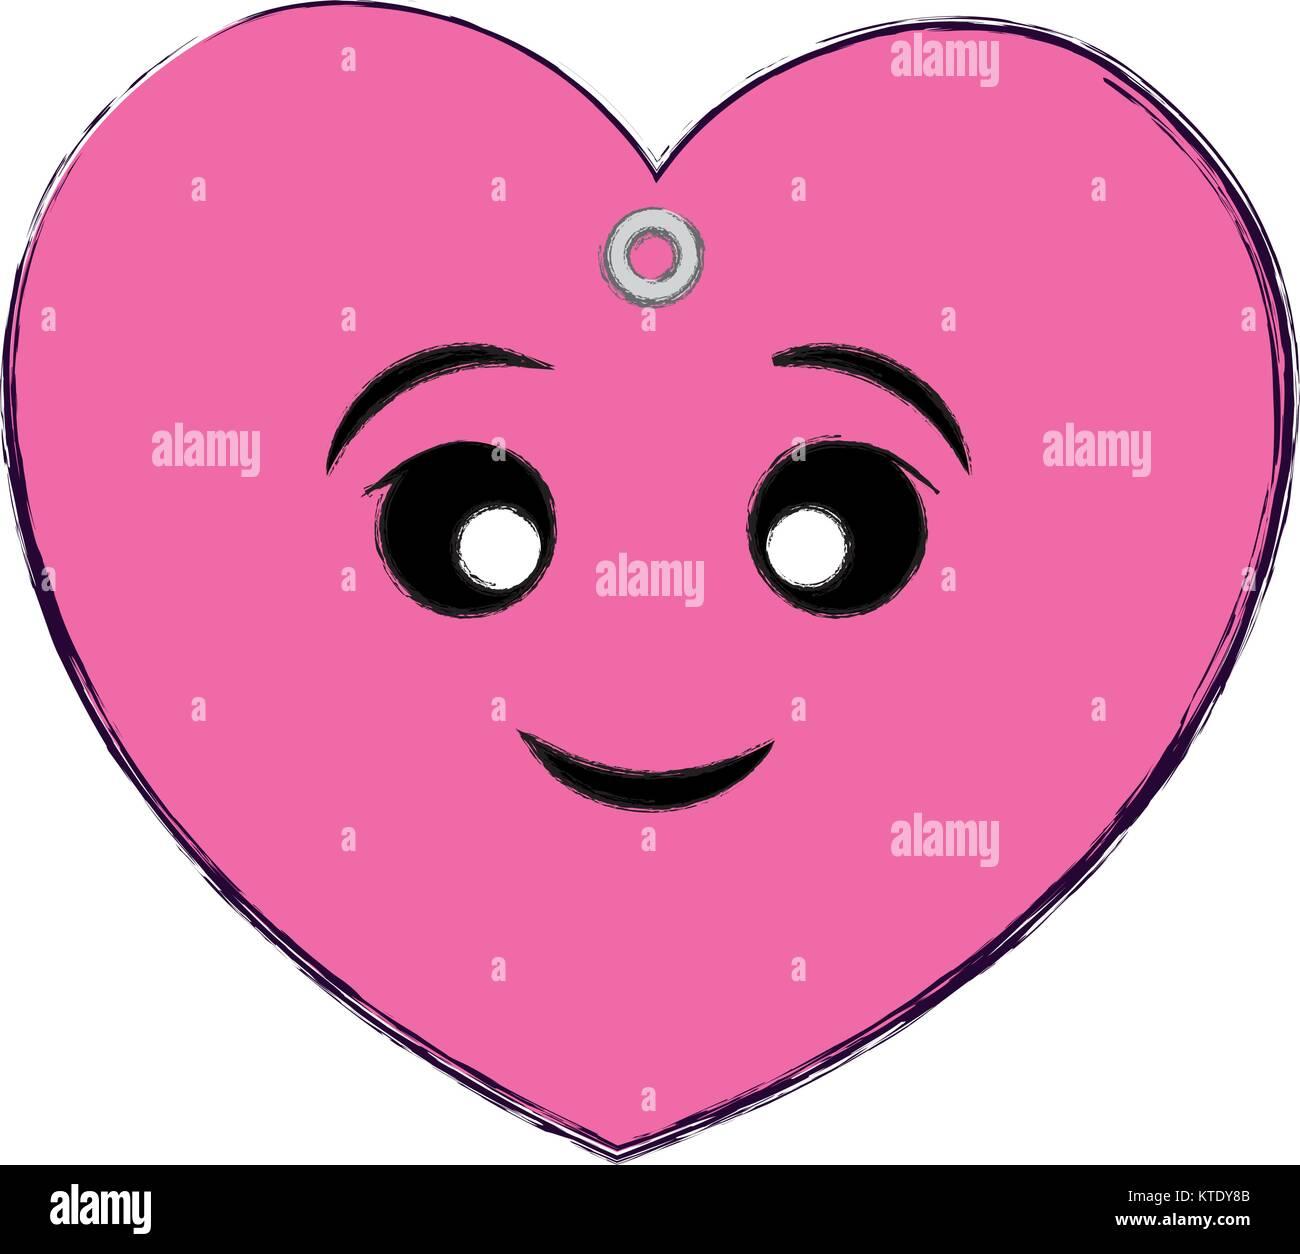 kawaii pink heart icon - Stock Vector